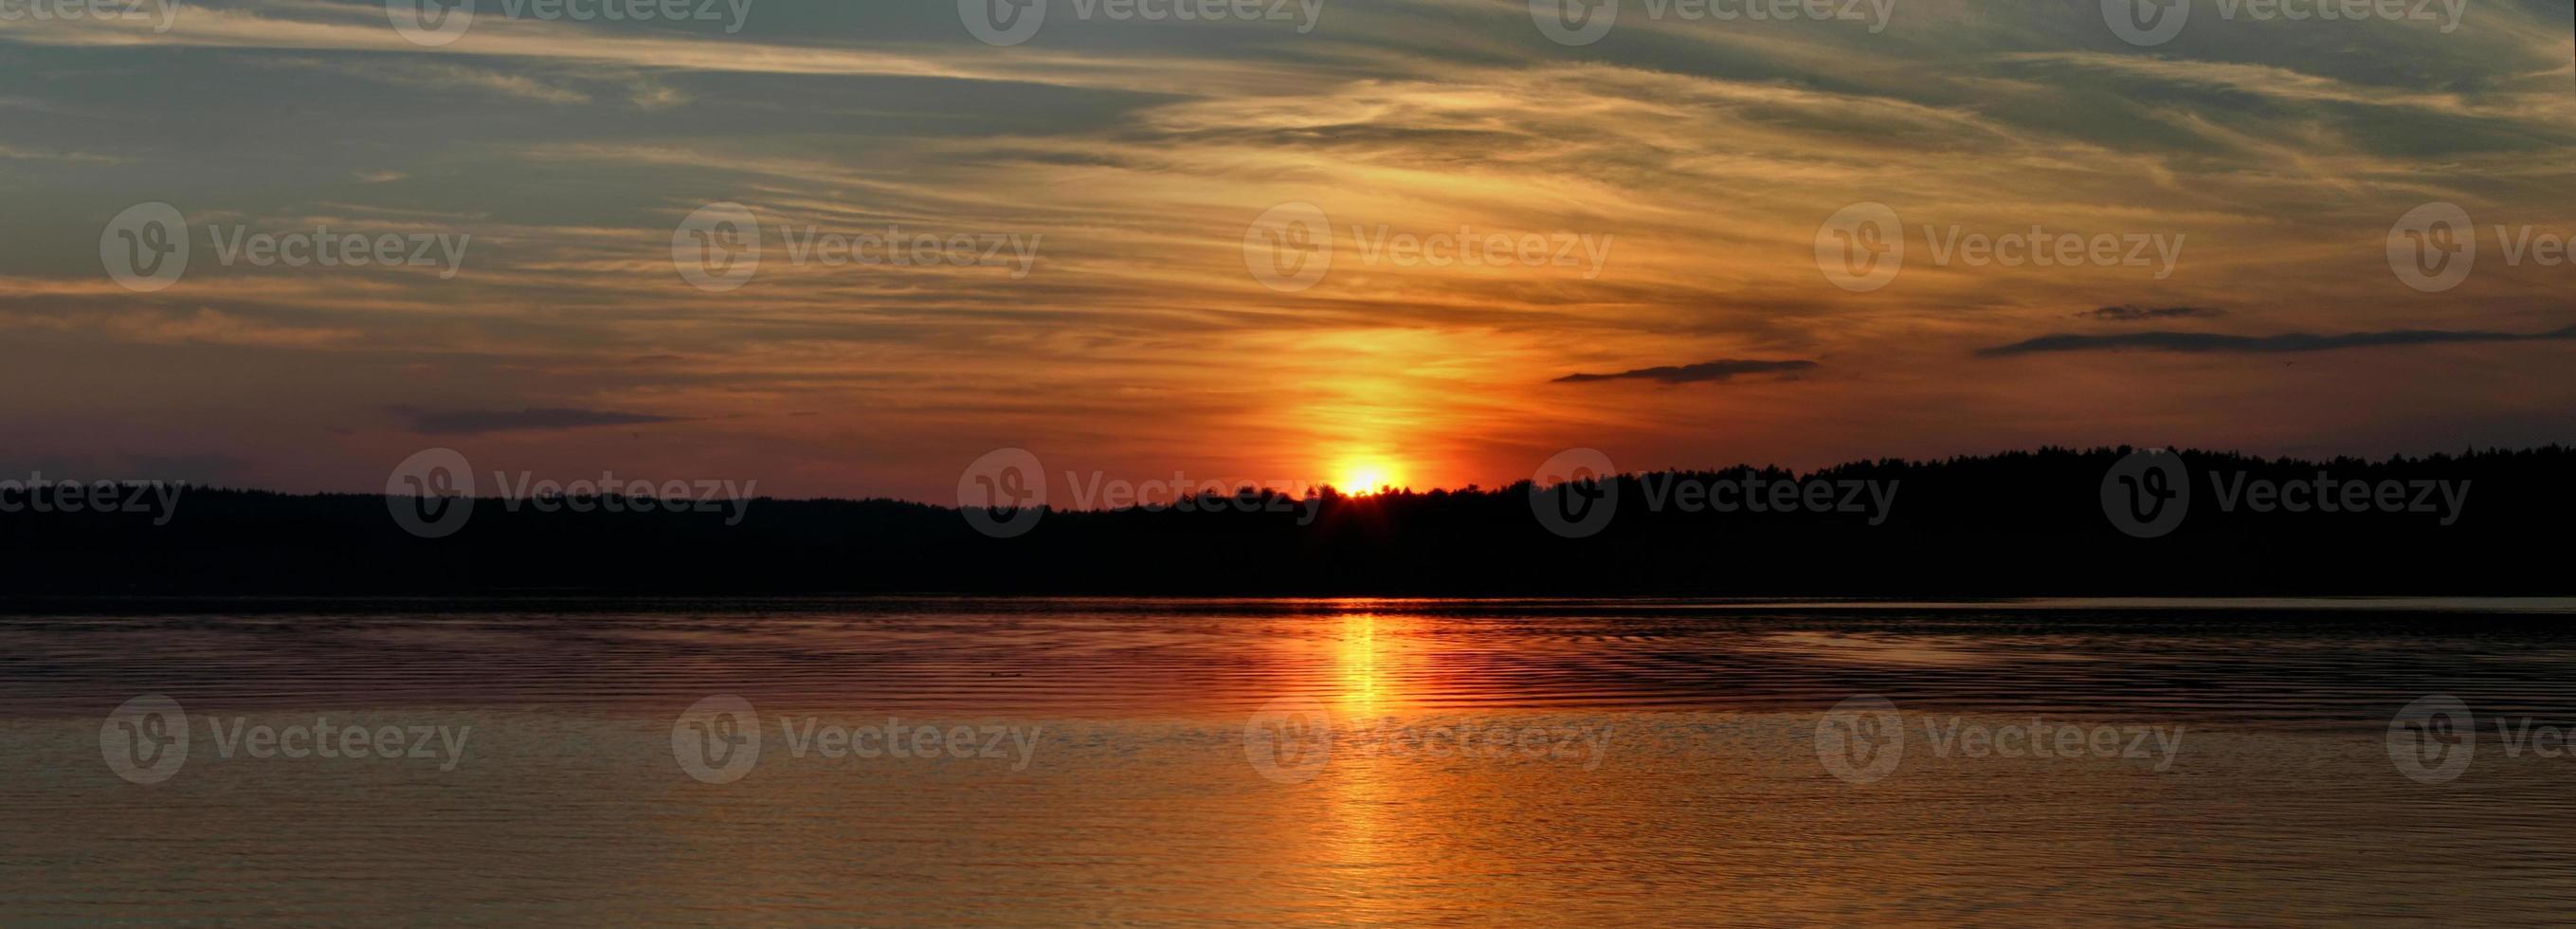 Sonnenuntergangspanorama foto